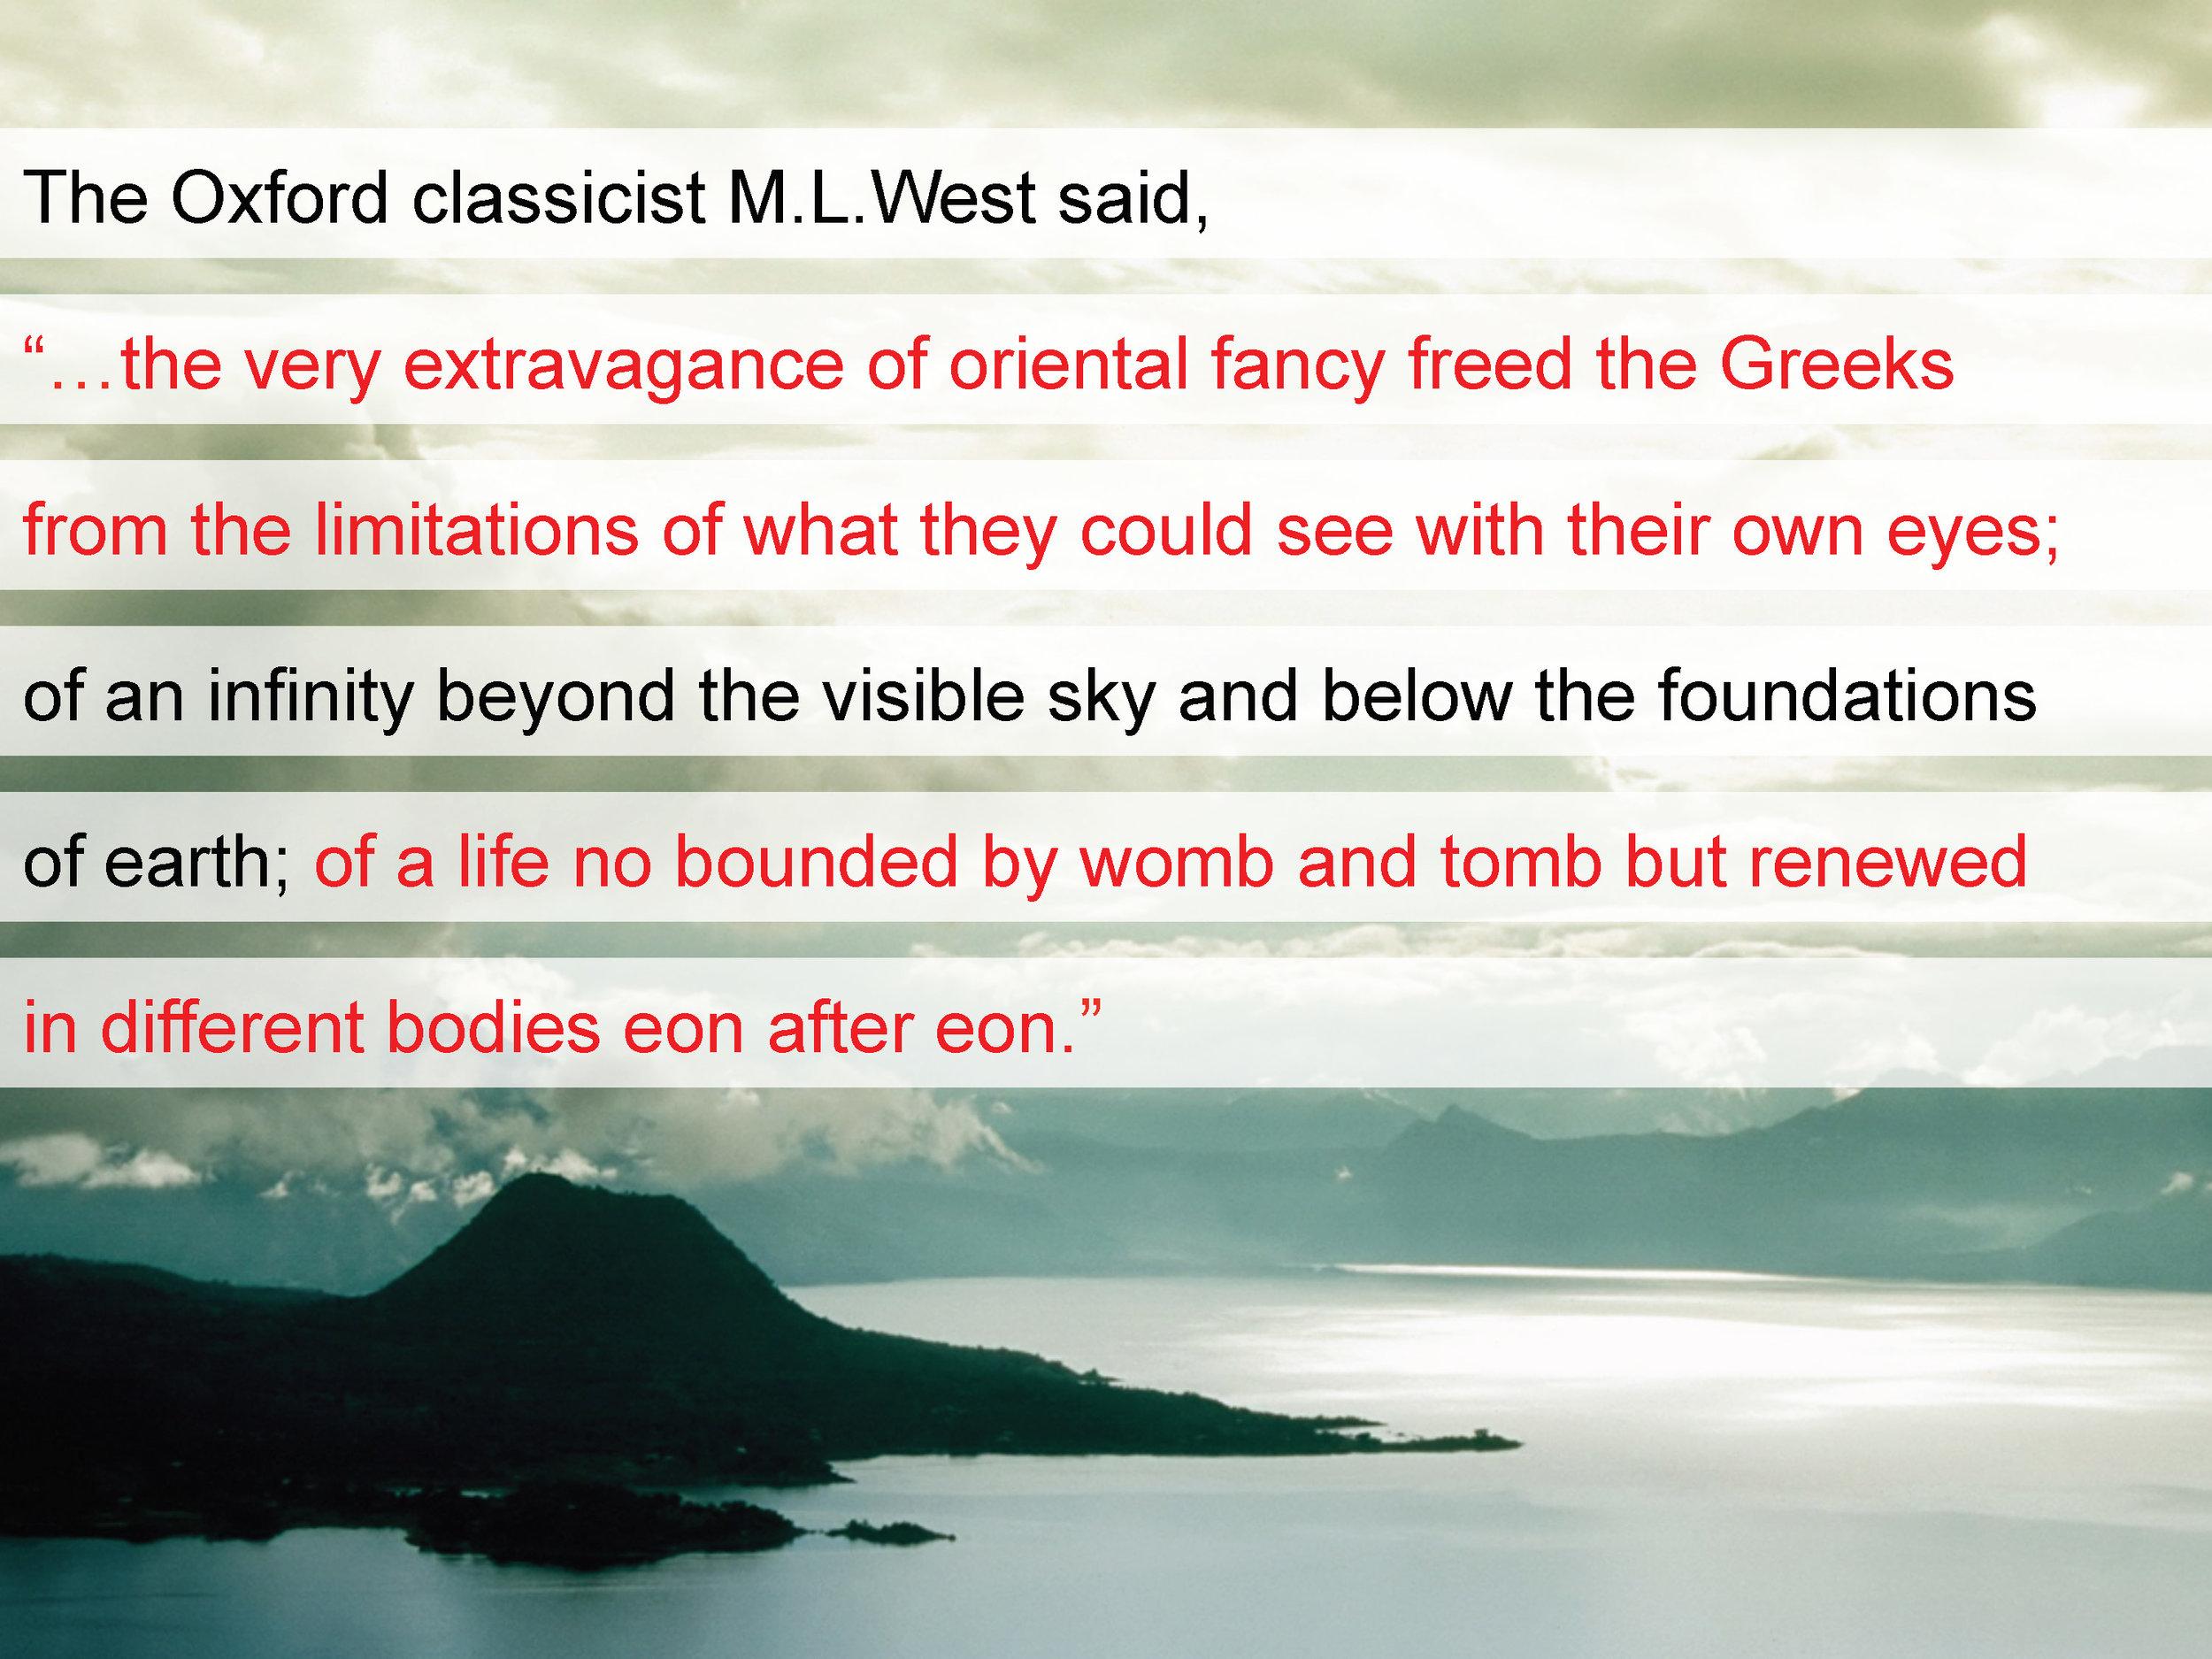 Naga_Oxford classicist ML West.jpg